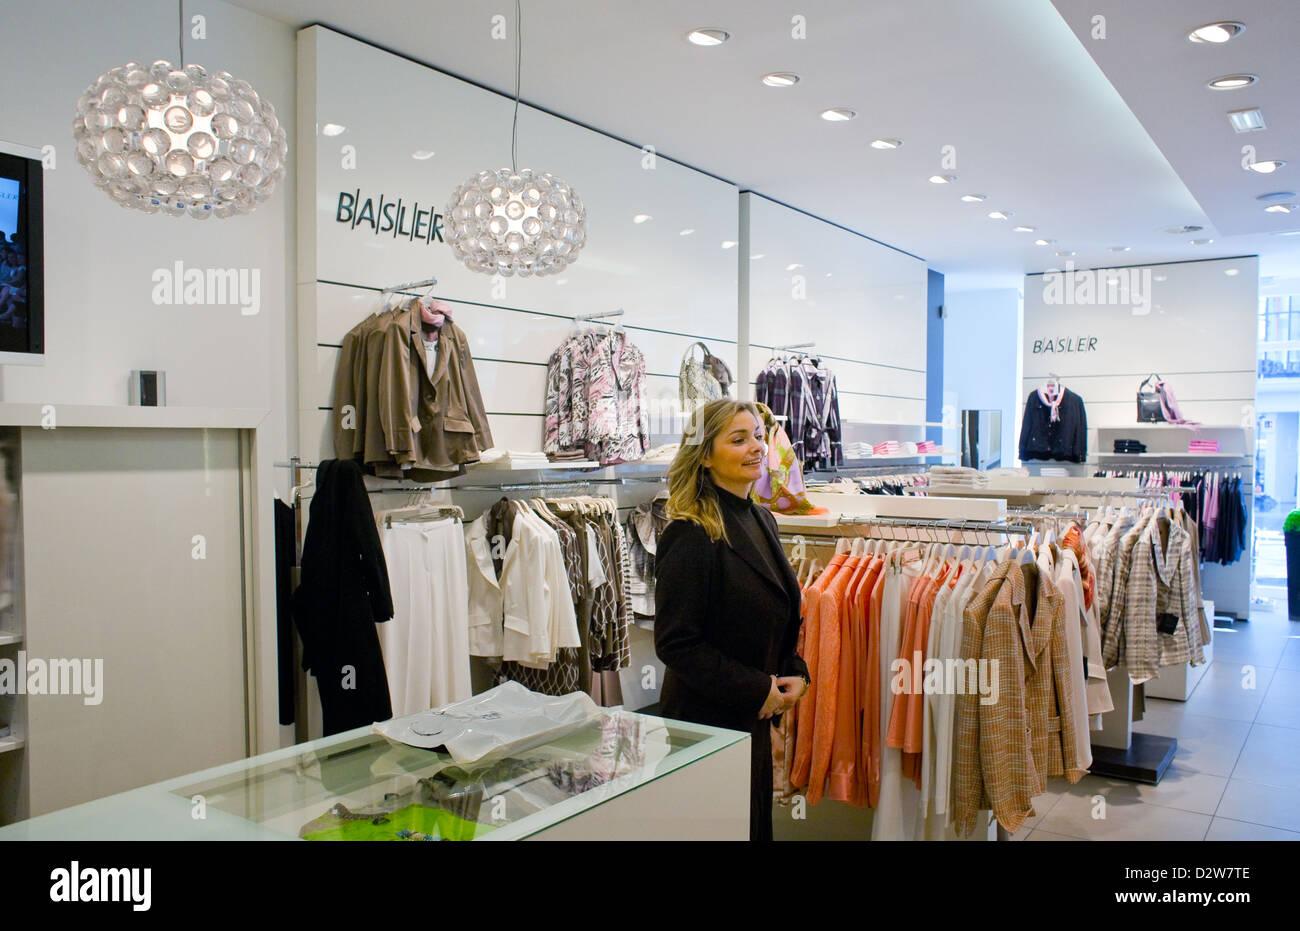 783488e662 Berlin, Germany, sales girl in Basler Fashion Store in Steglitz - Stock  Image